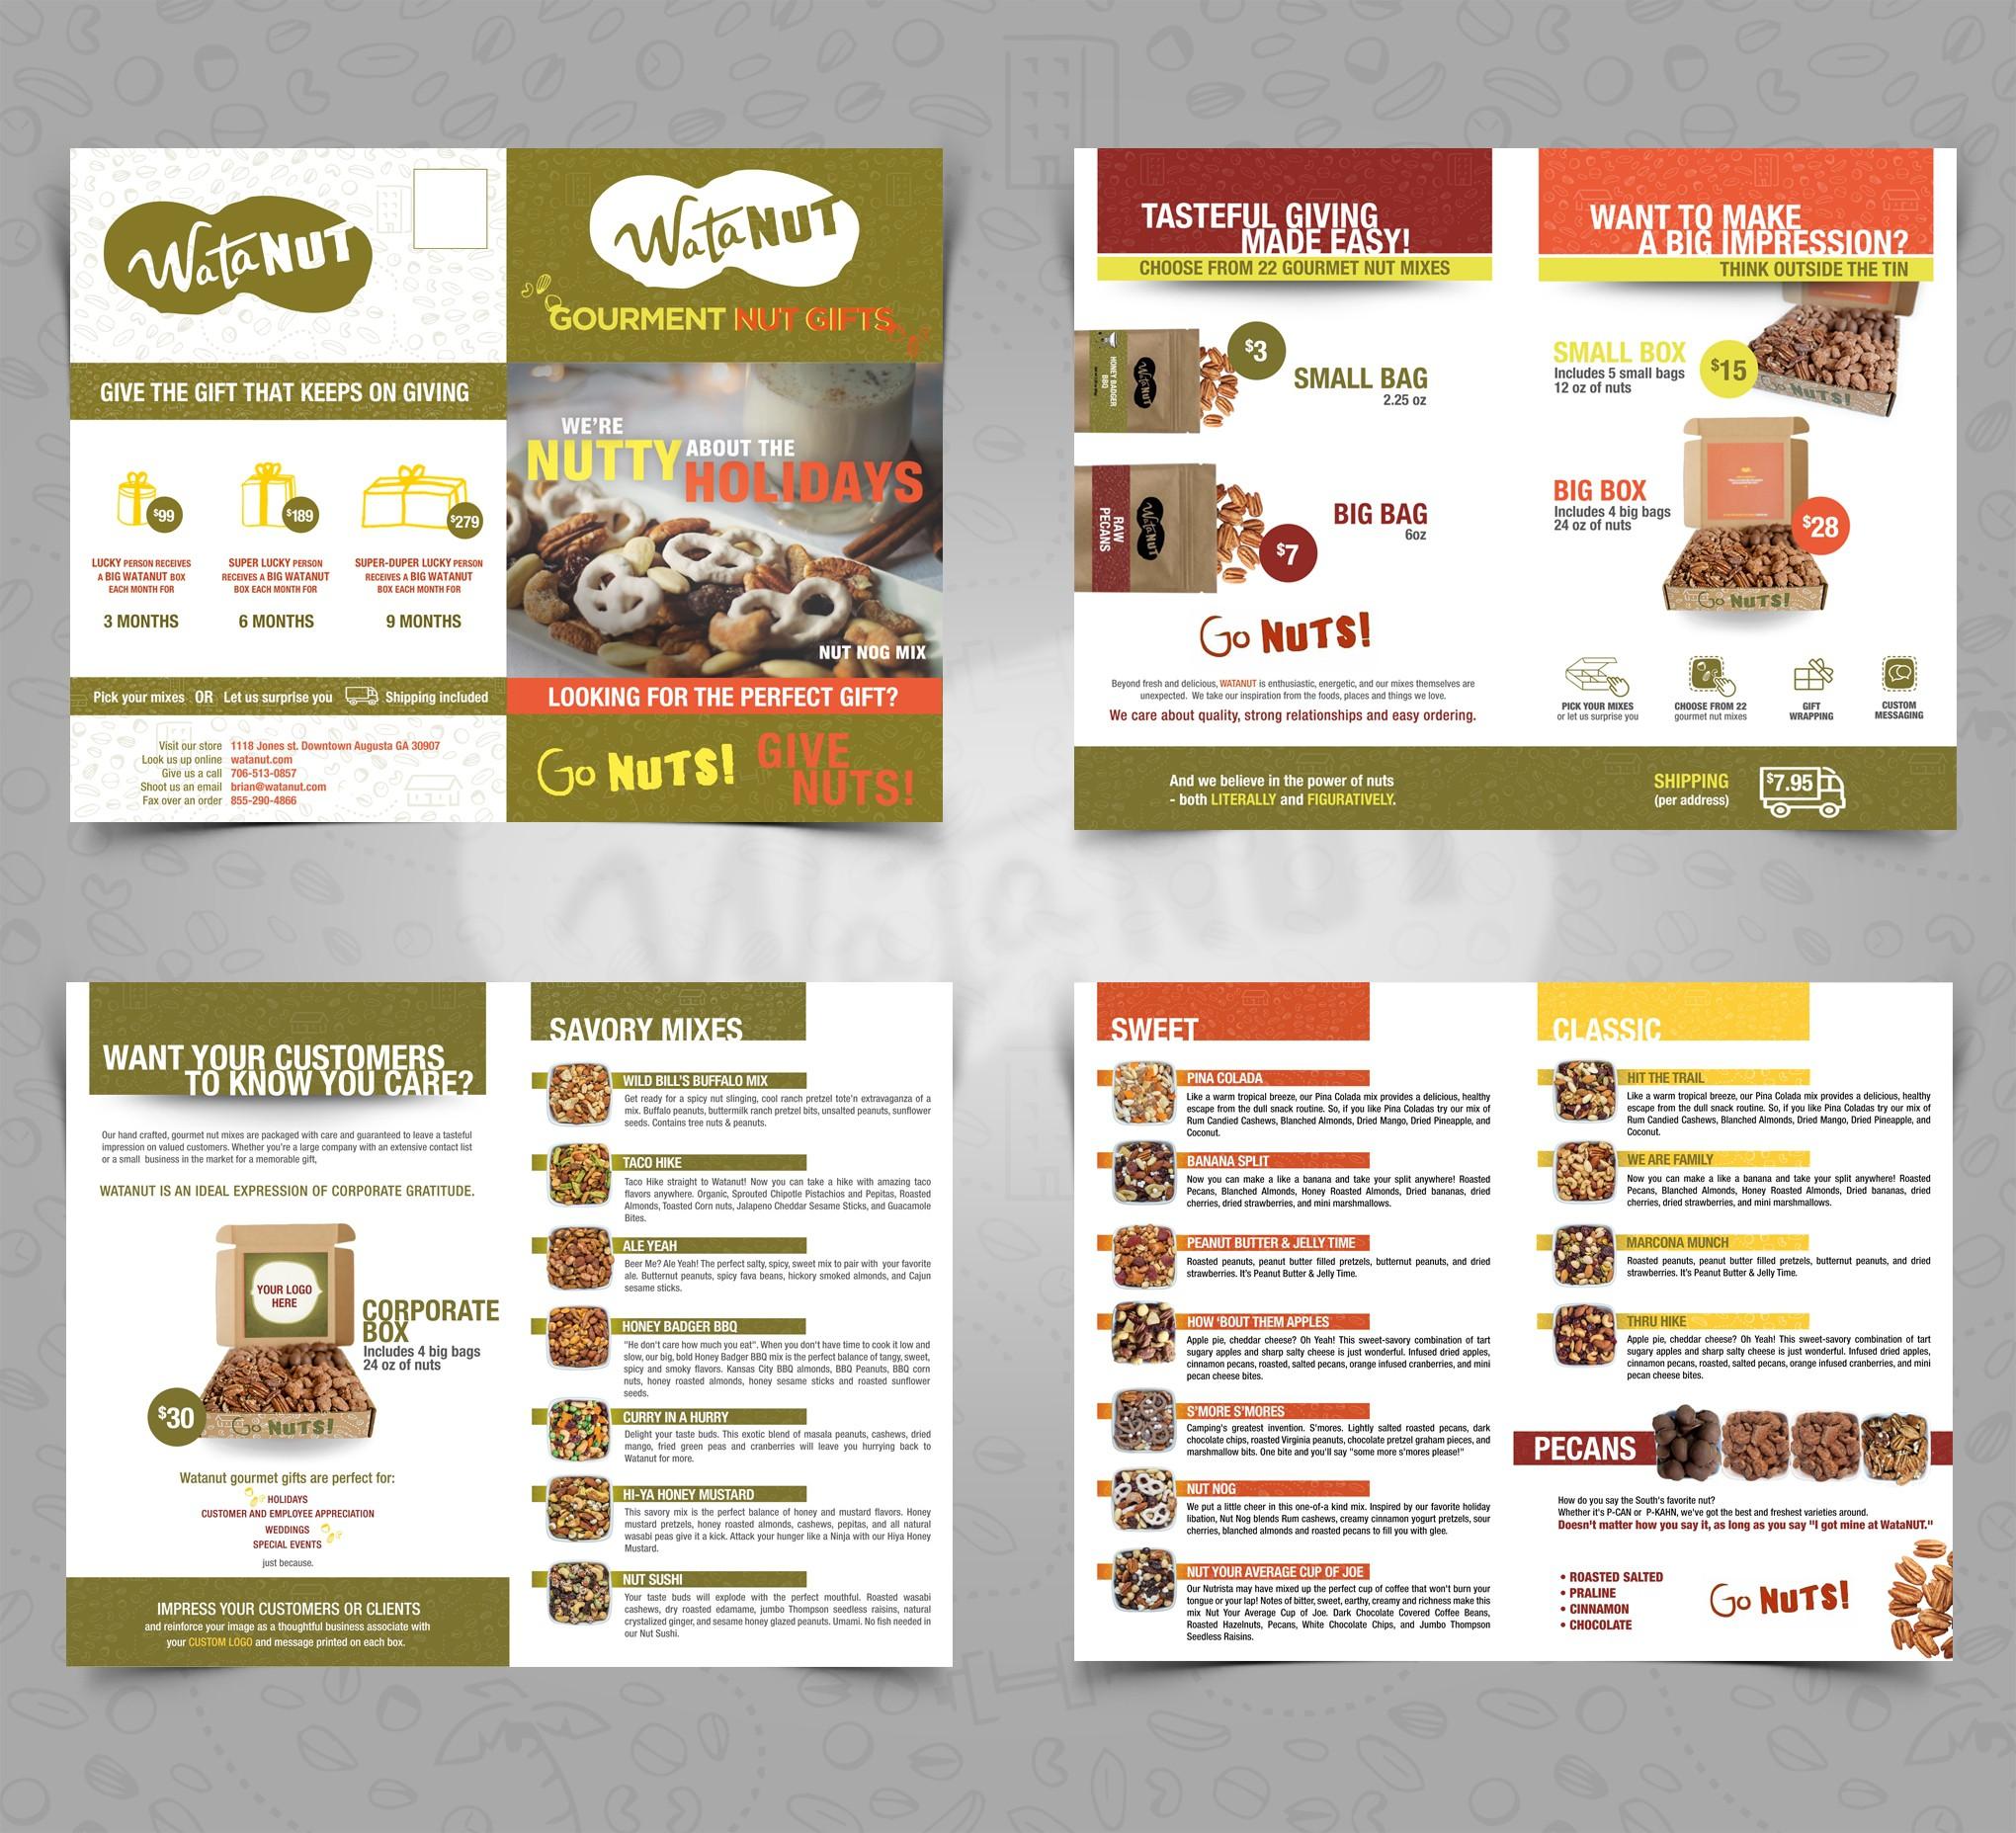 Create awesome holiday brochure for gourmet nut company Watanut